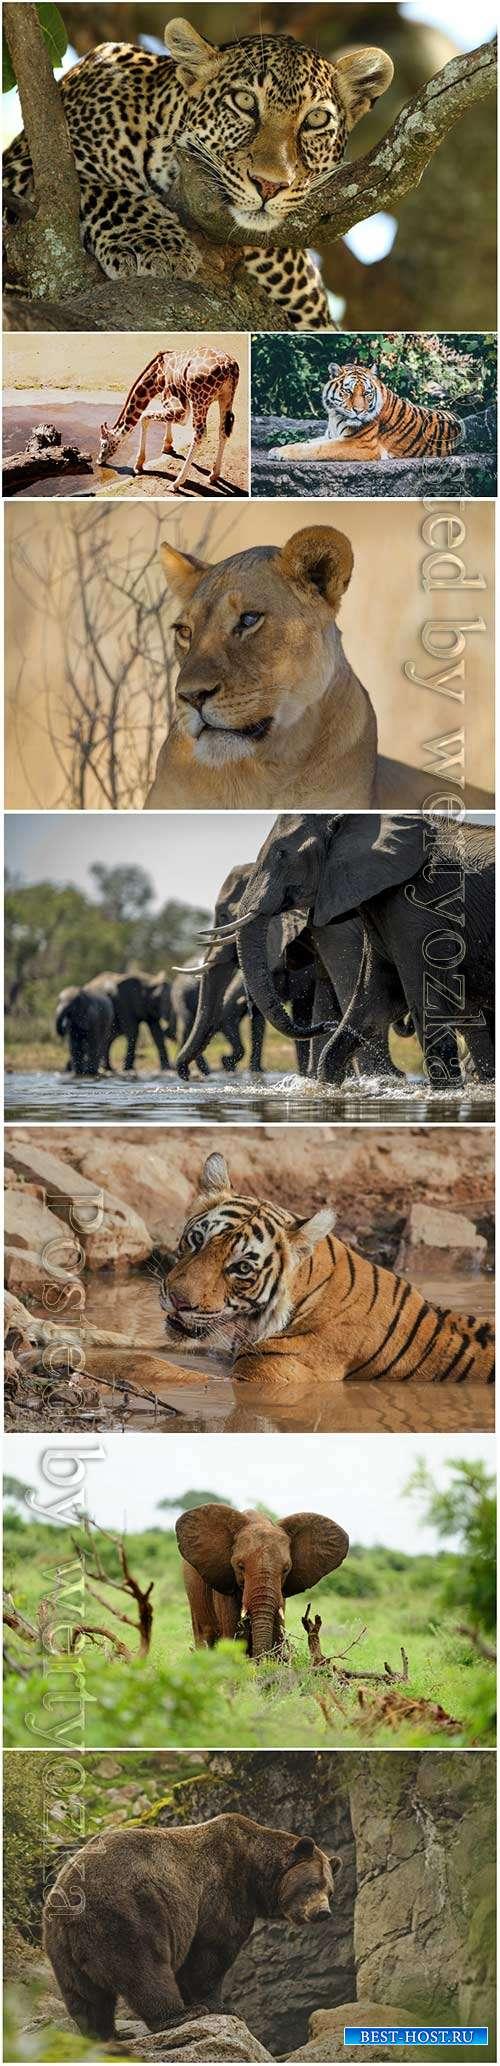 Animals, tiger, elephant, leopard, bear